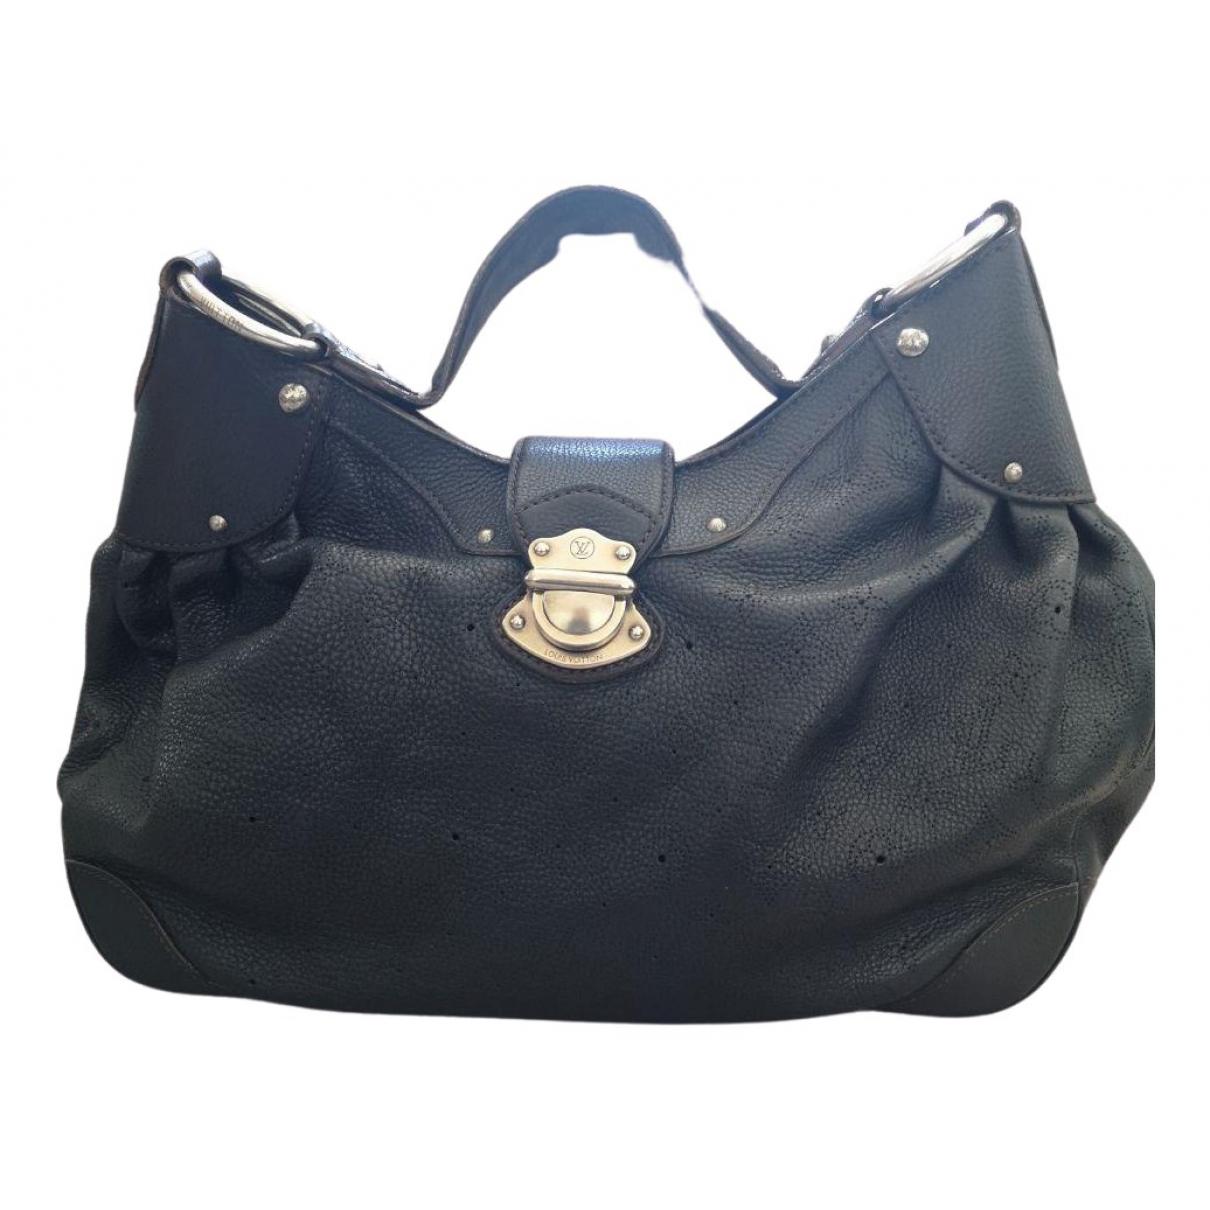 Louis Vuitton - Sac a main Mahina pour femme en cuir - noir